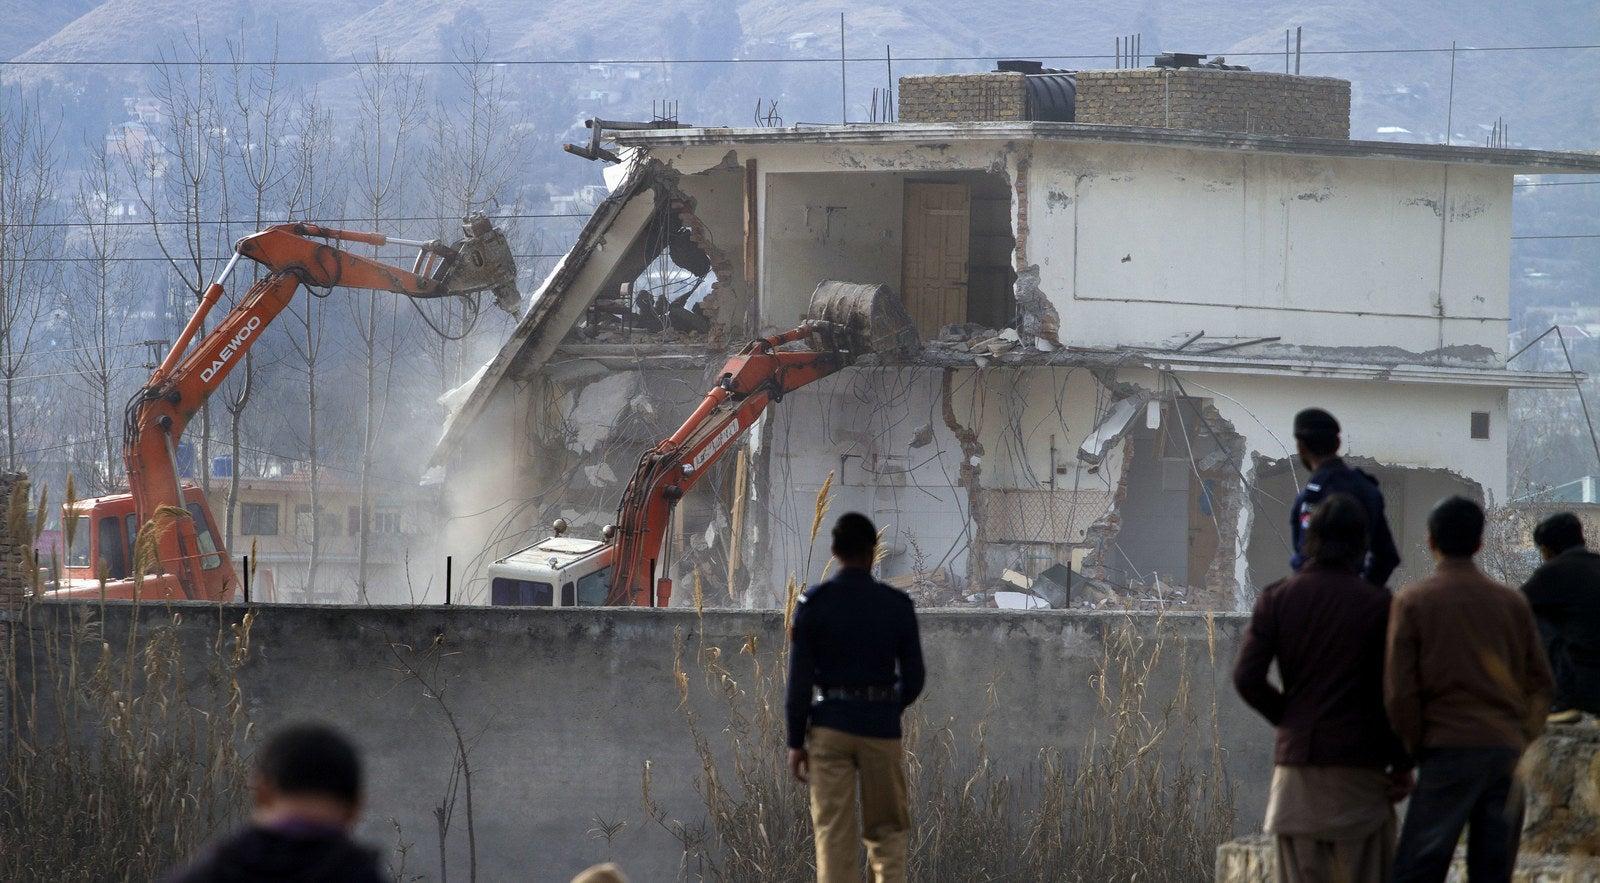 Pakistani authorities use heavy machinery to demolish the compound of Osama bin Laden in Abbottabad, Pakistan.